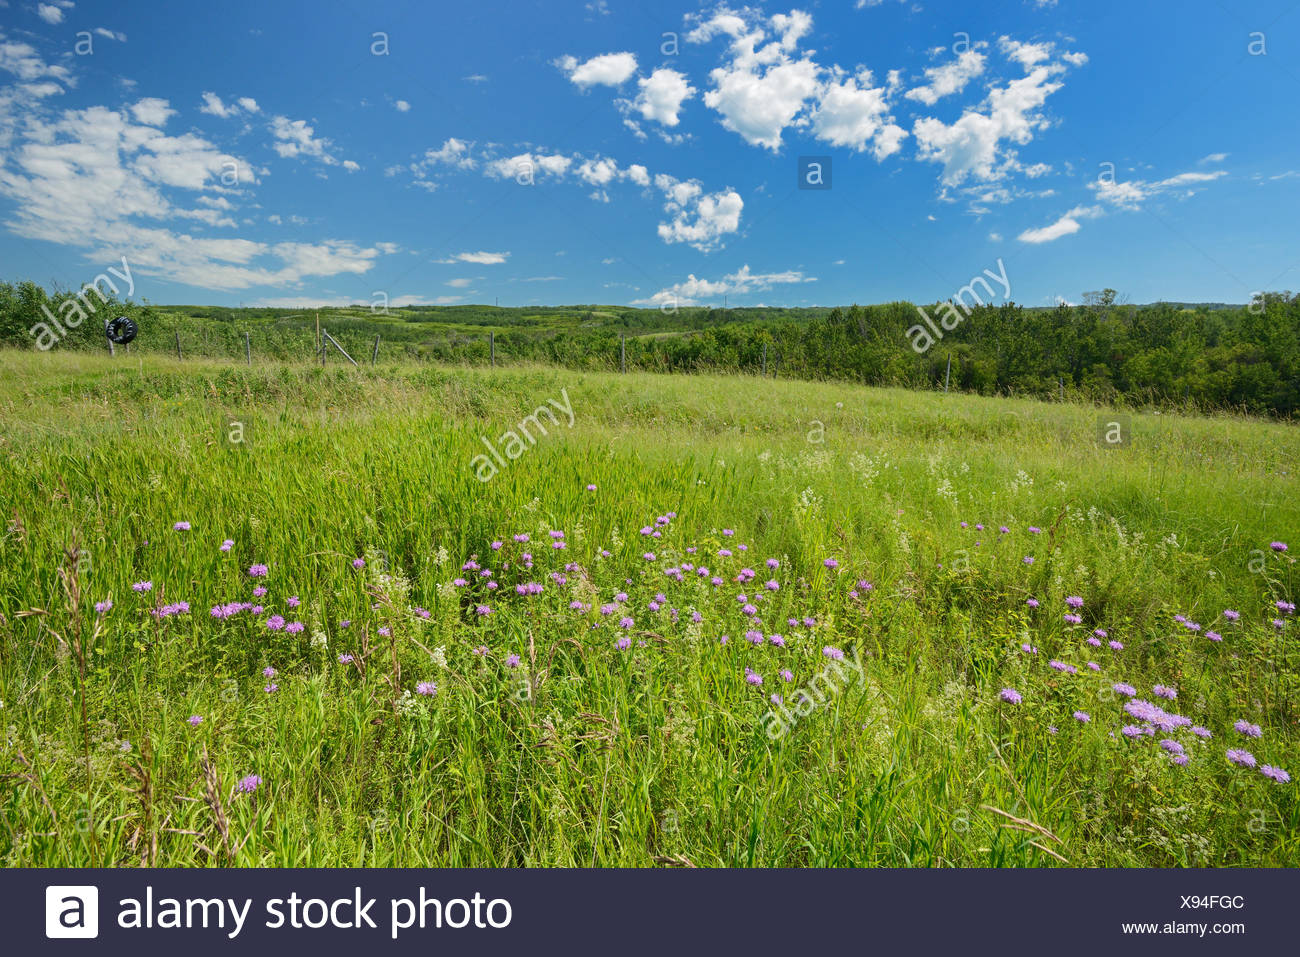 Wild bergamot or bee balm (Monarda fistulosa) flowers on the prairie of the Saskatoon Trail  Near Battleford Saskatchewan Canada - Stock Image